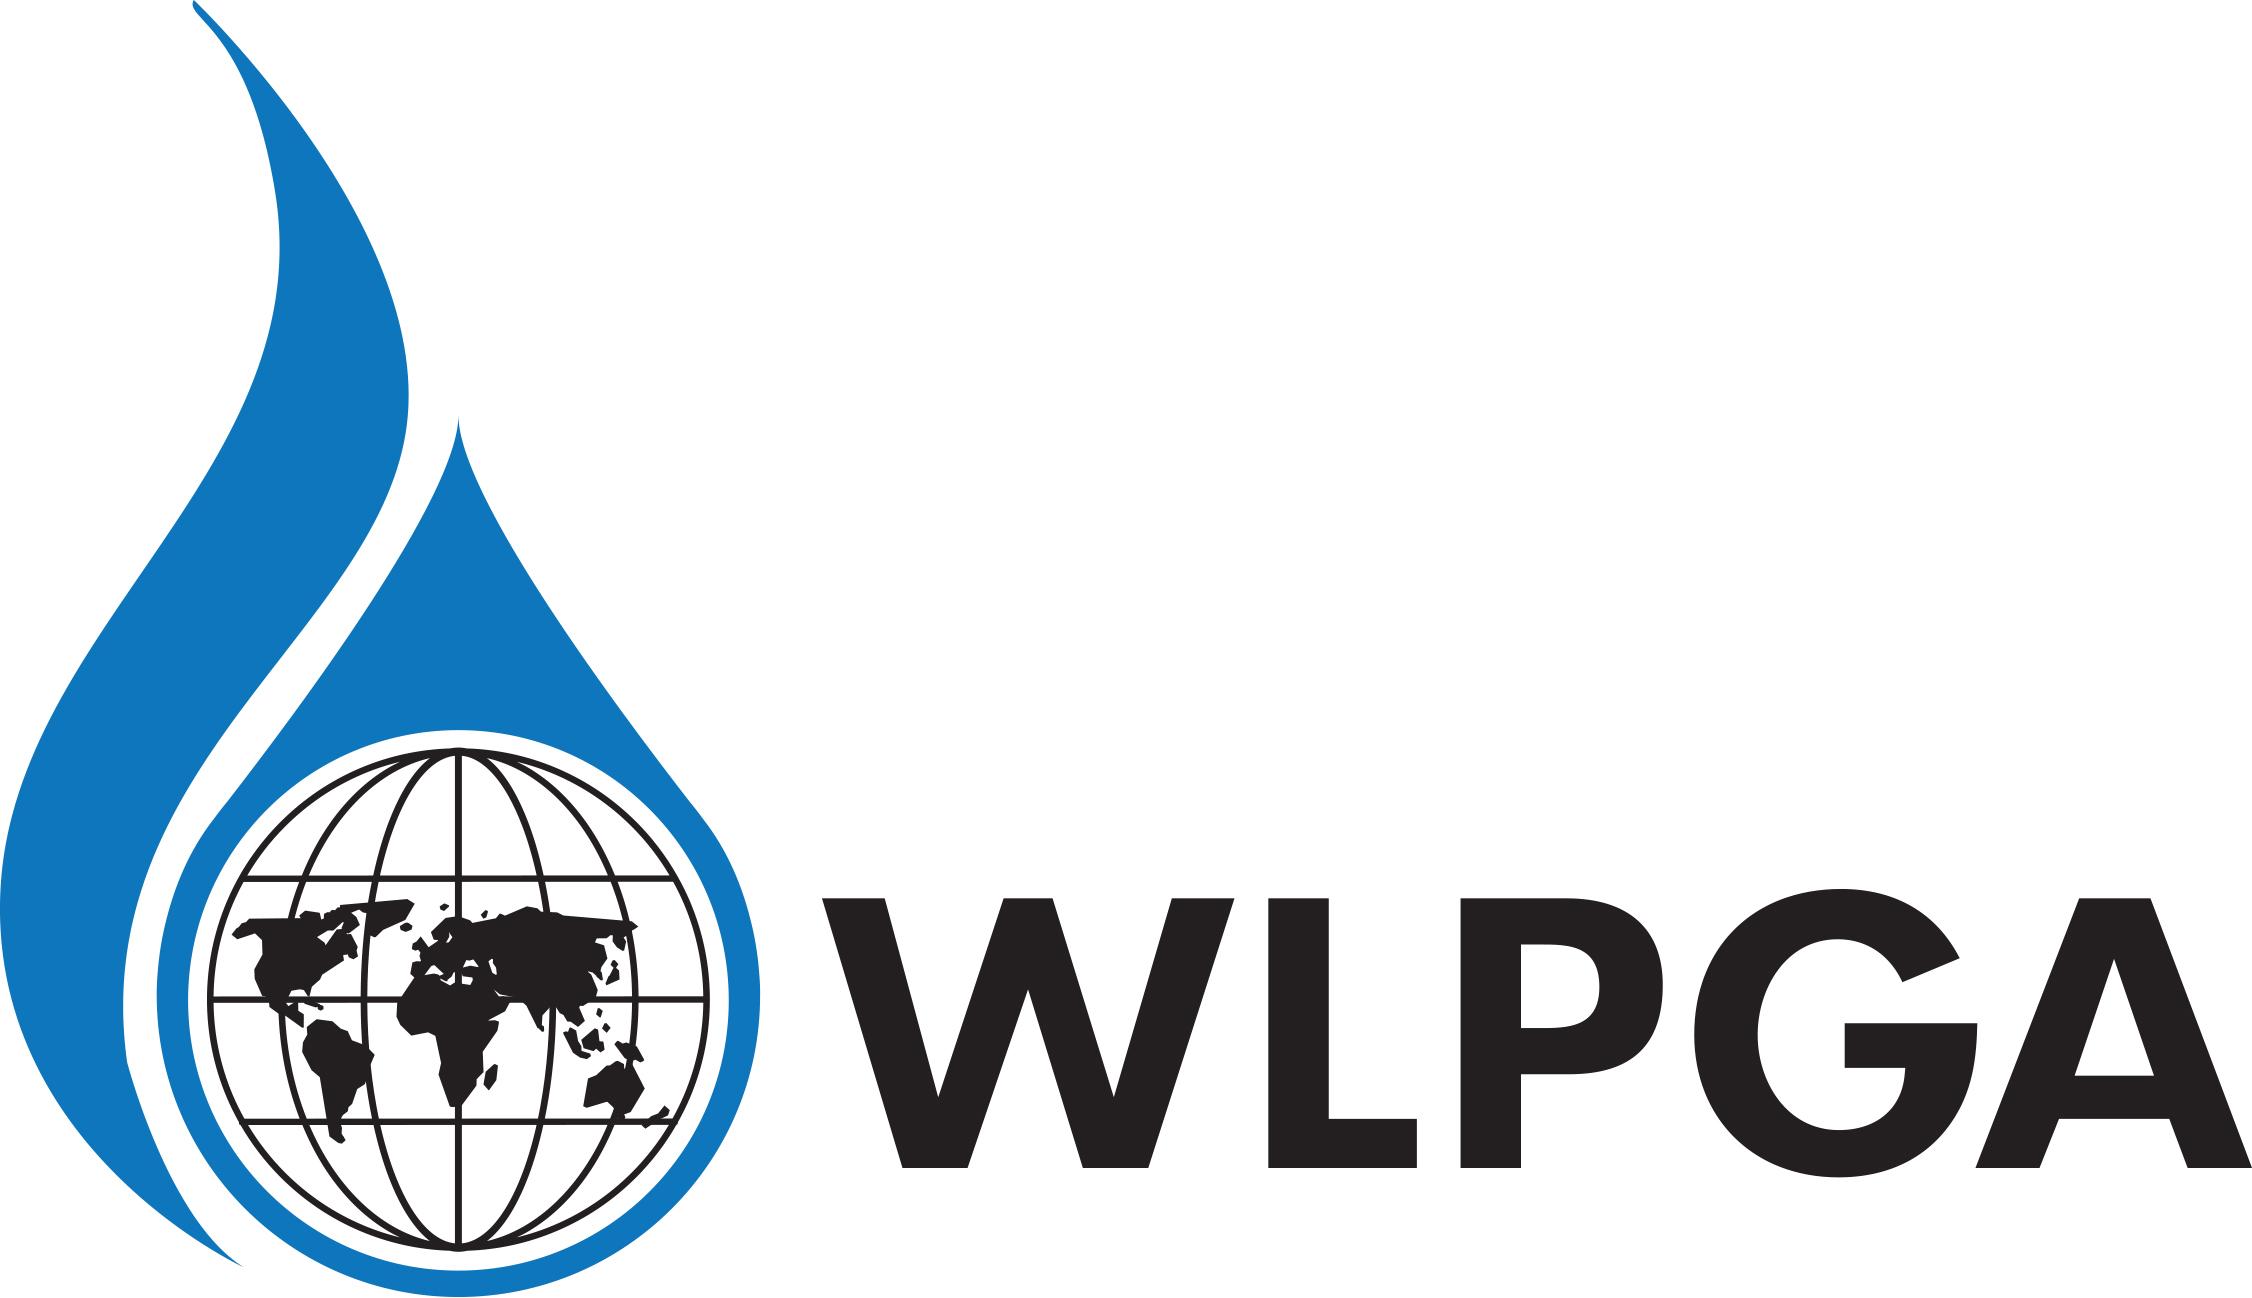 A--WLPGA-logo.jpg